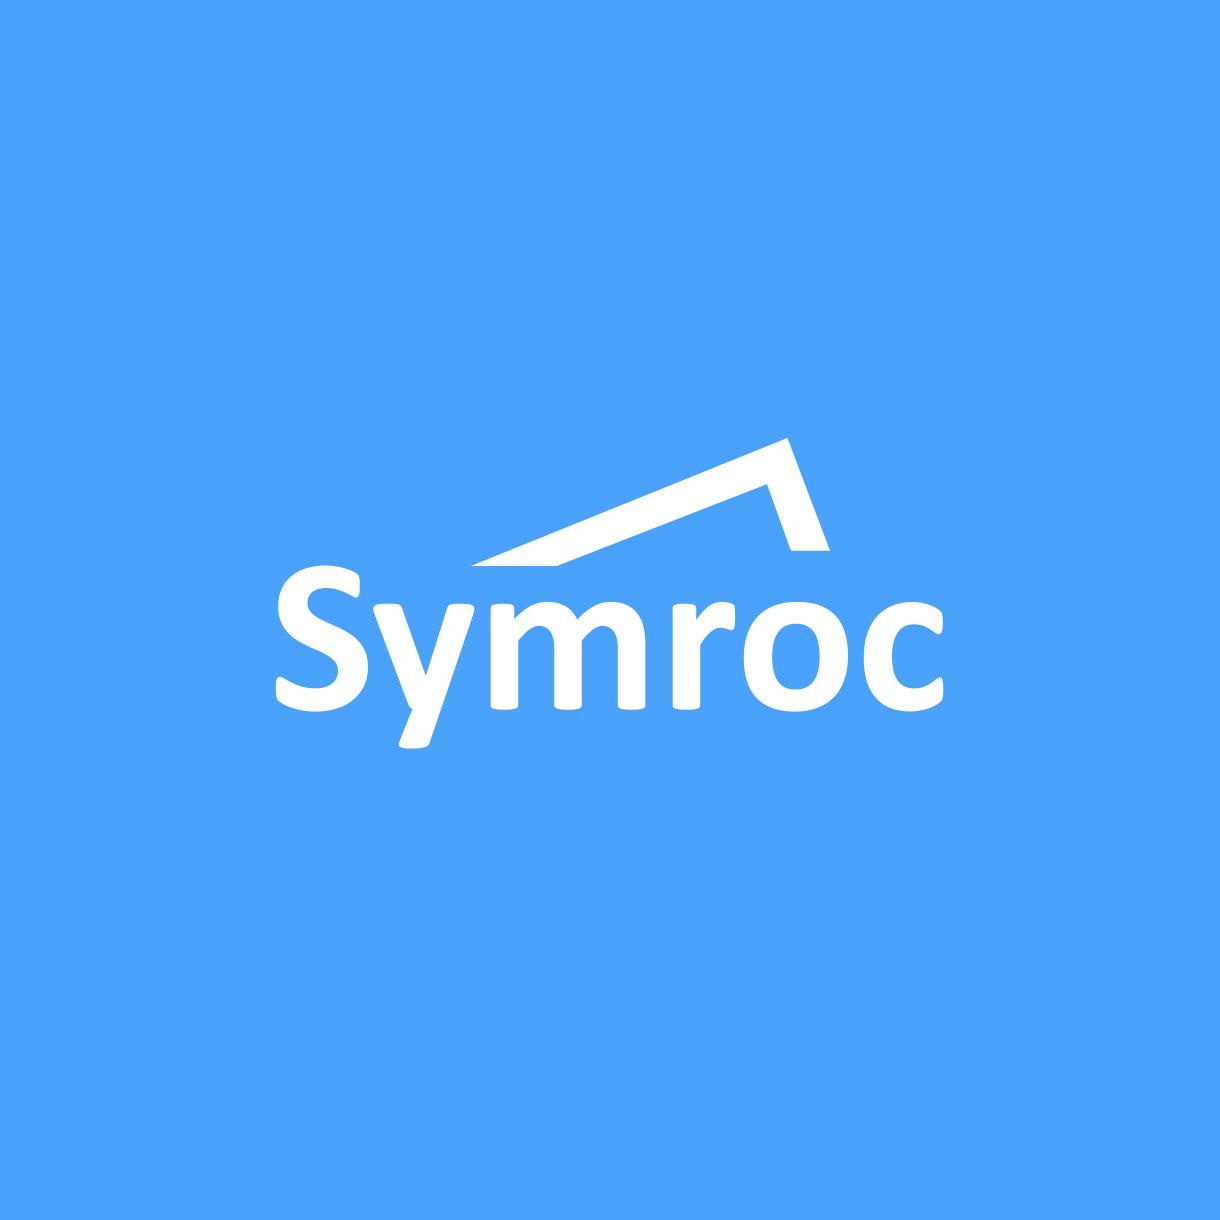 Symroc Icon